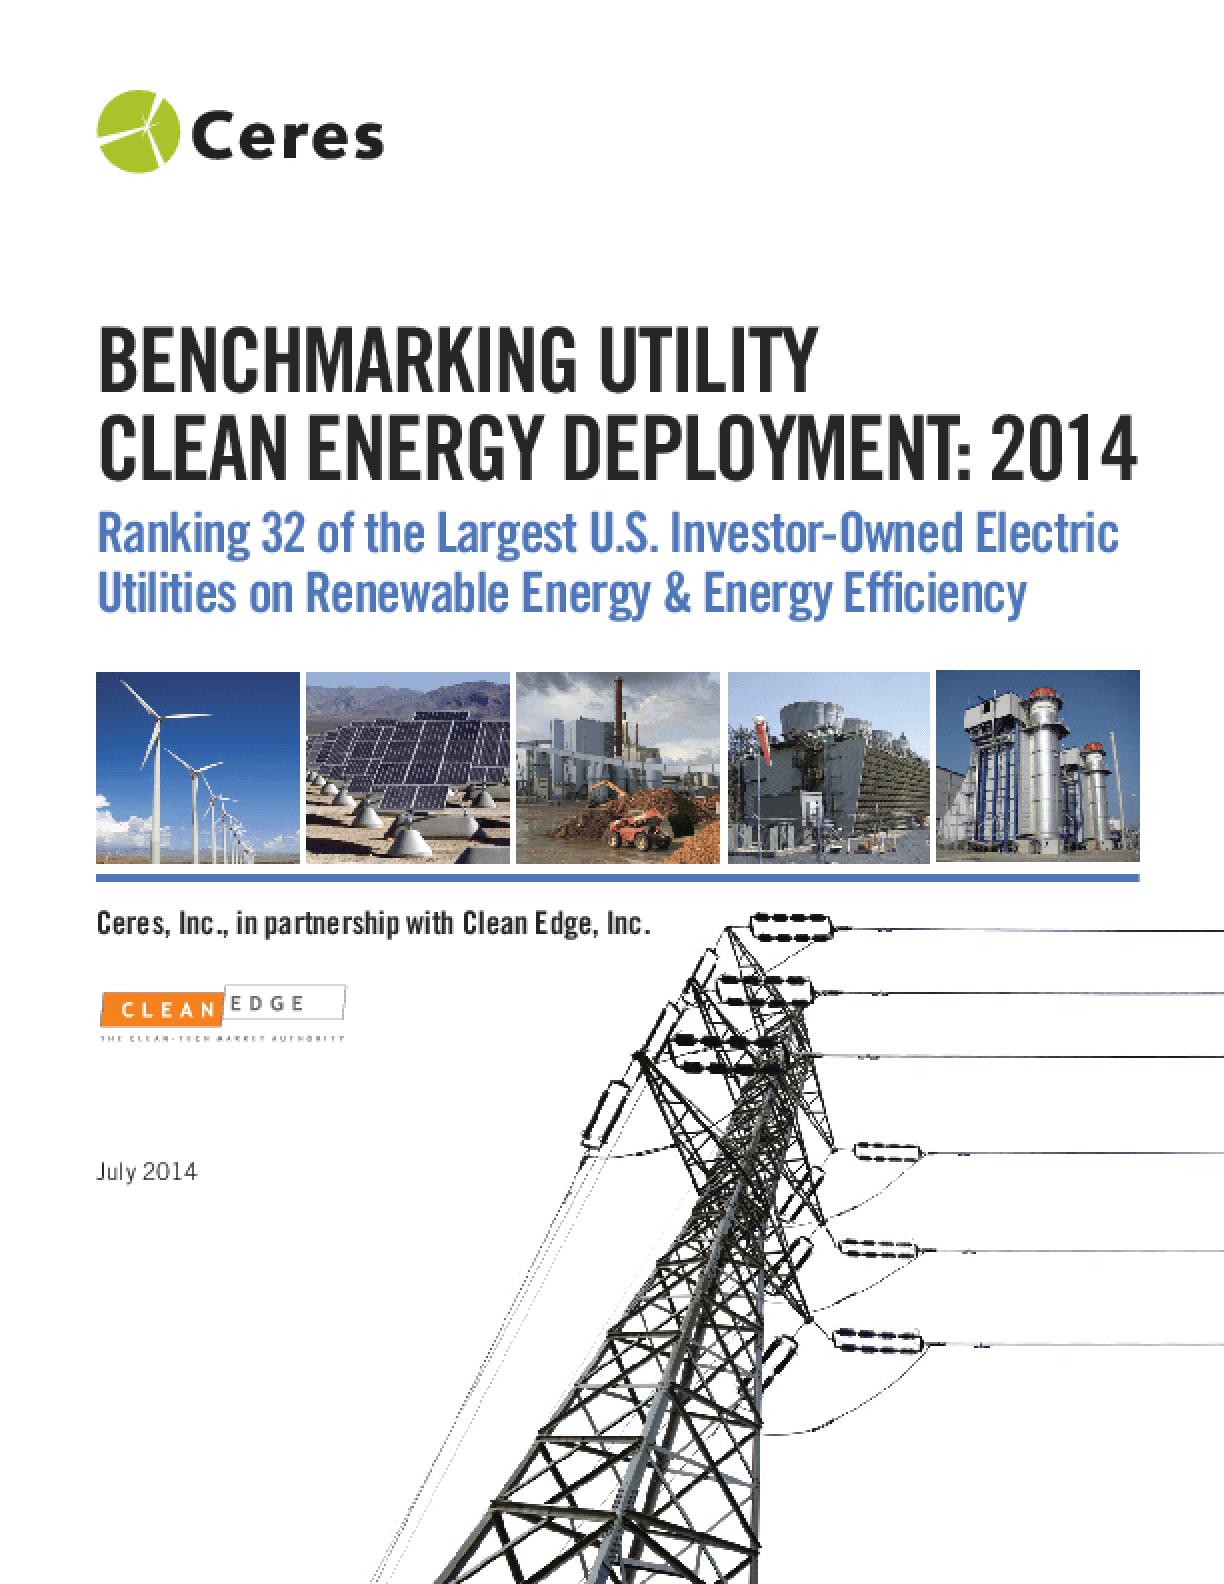 Benchmarking Utility Clean Energy Deployment: 2014